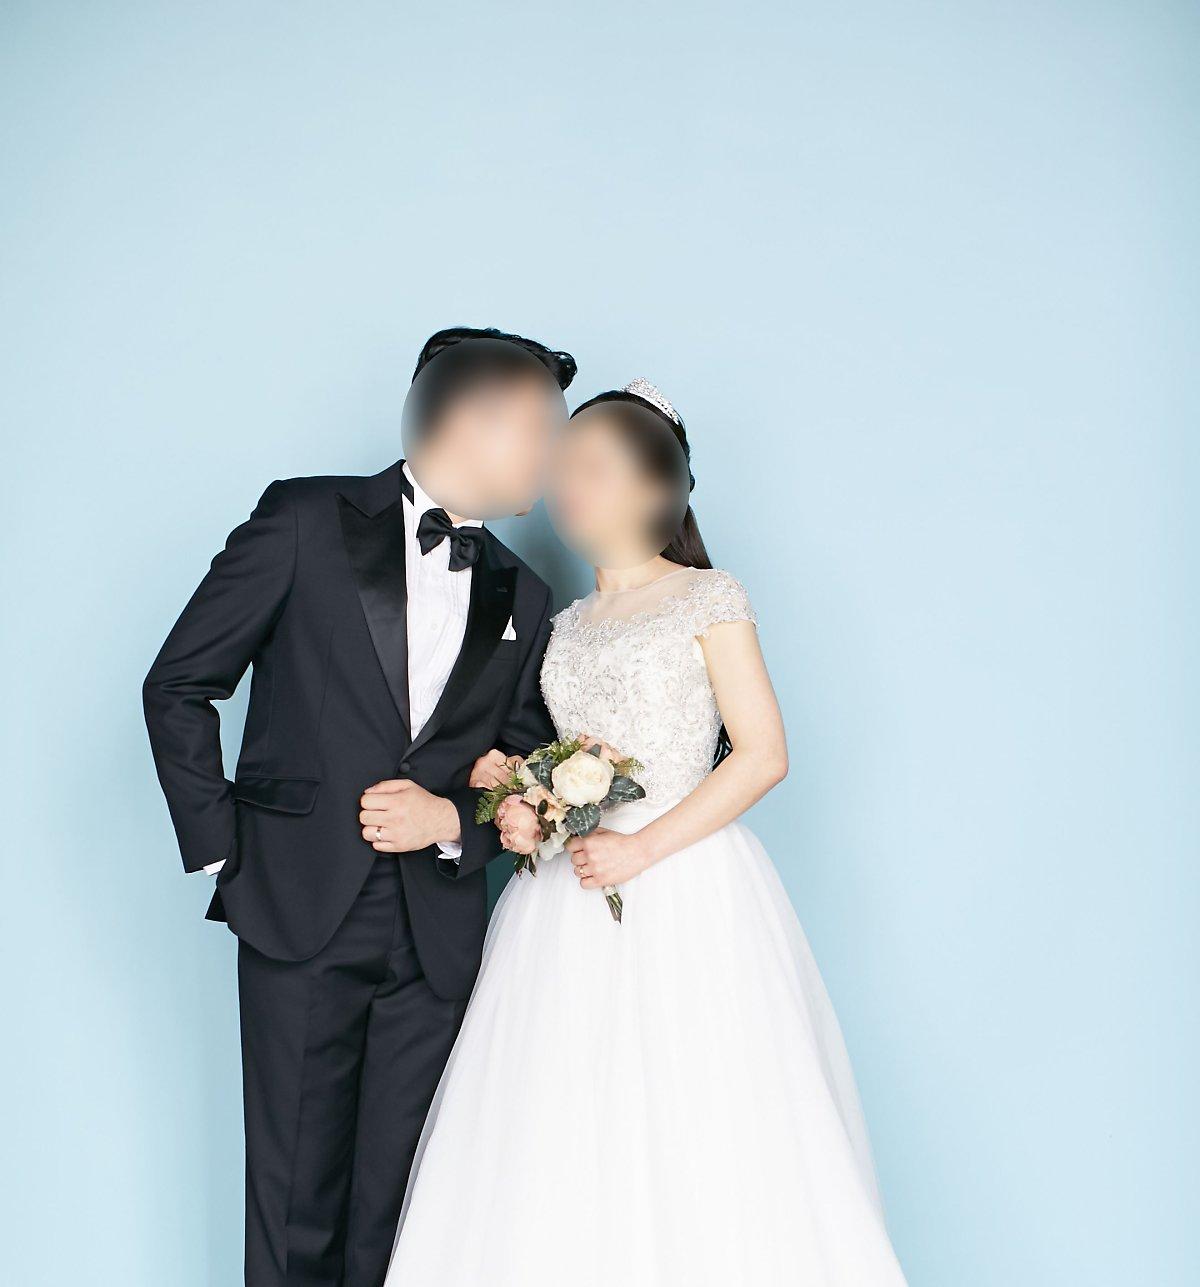 3353118880e 웨딩촬영, 턱시도대여, 맞춤정장, 결혼예보, 턱시도렌탈, 루쏘소 신랑예복 블랙 자카드 문양이 매력적인 턱시도 M-20 입니다  고급실크사로 고풍스러운 무늬가 짜여진 ...